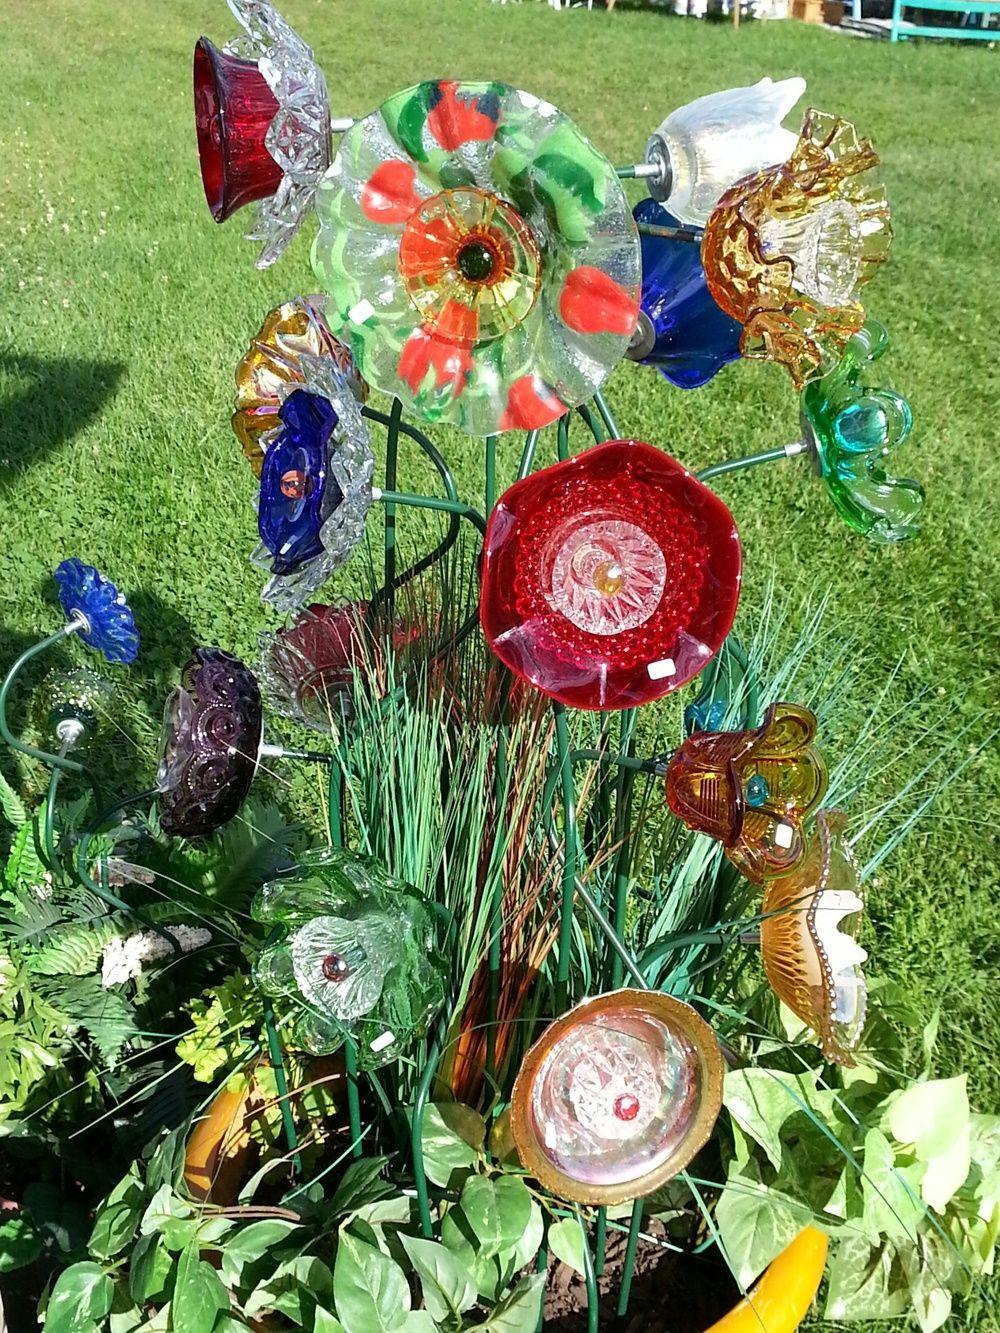 Trementozzi, Ann Marie - Creative Glass. — Roslindale Open Studios